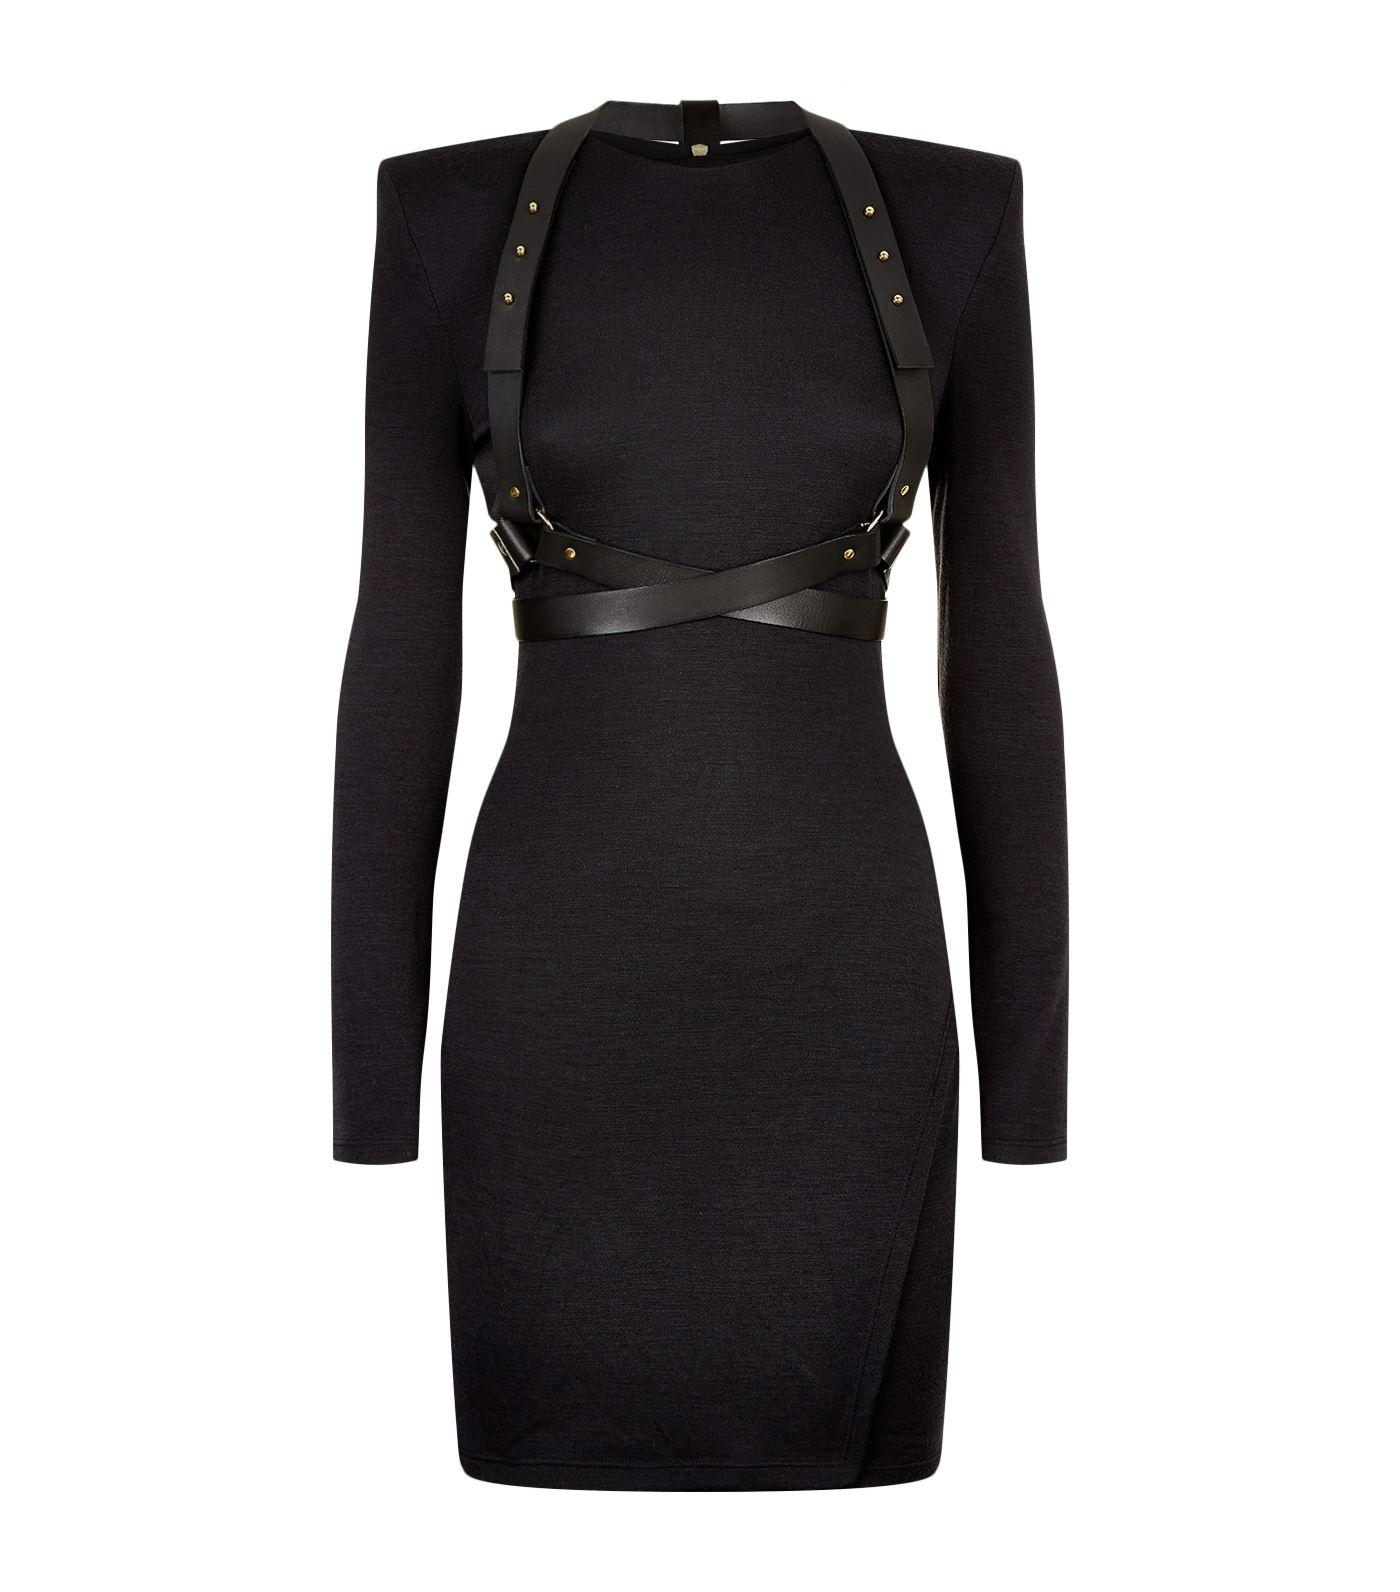 Balmain Leather Harness Mini Dress In Black